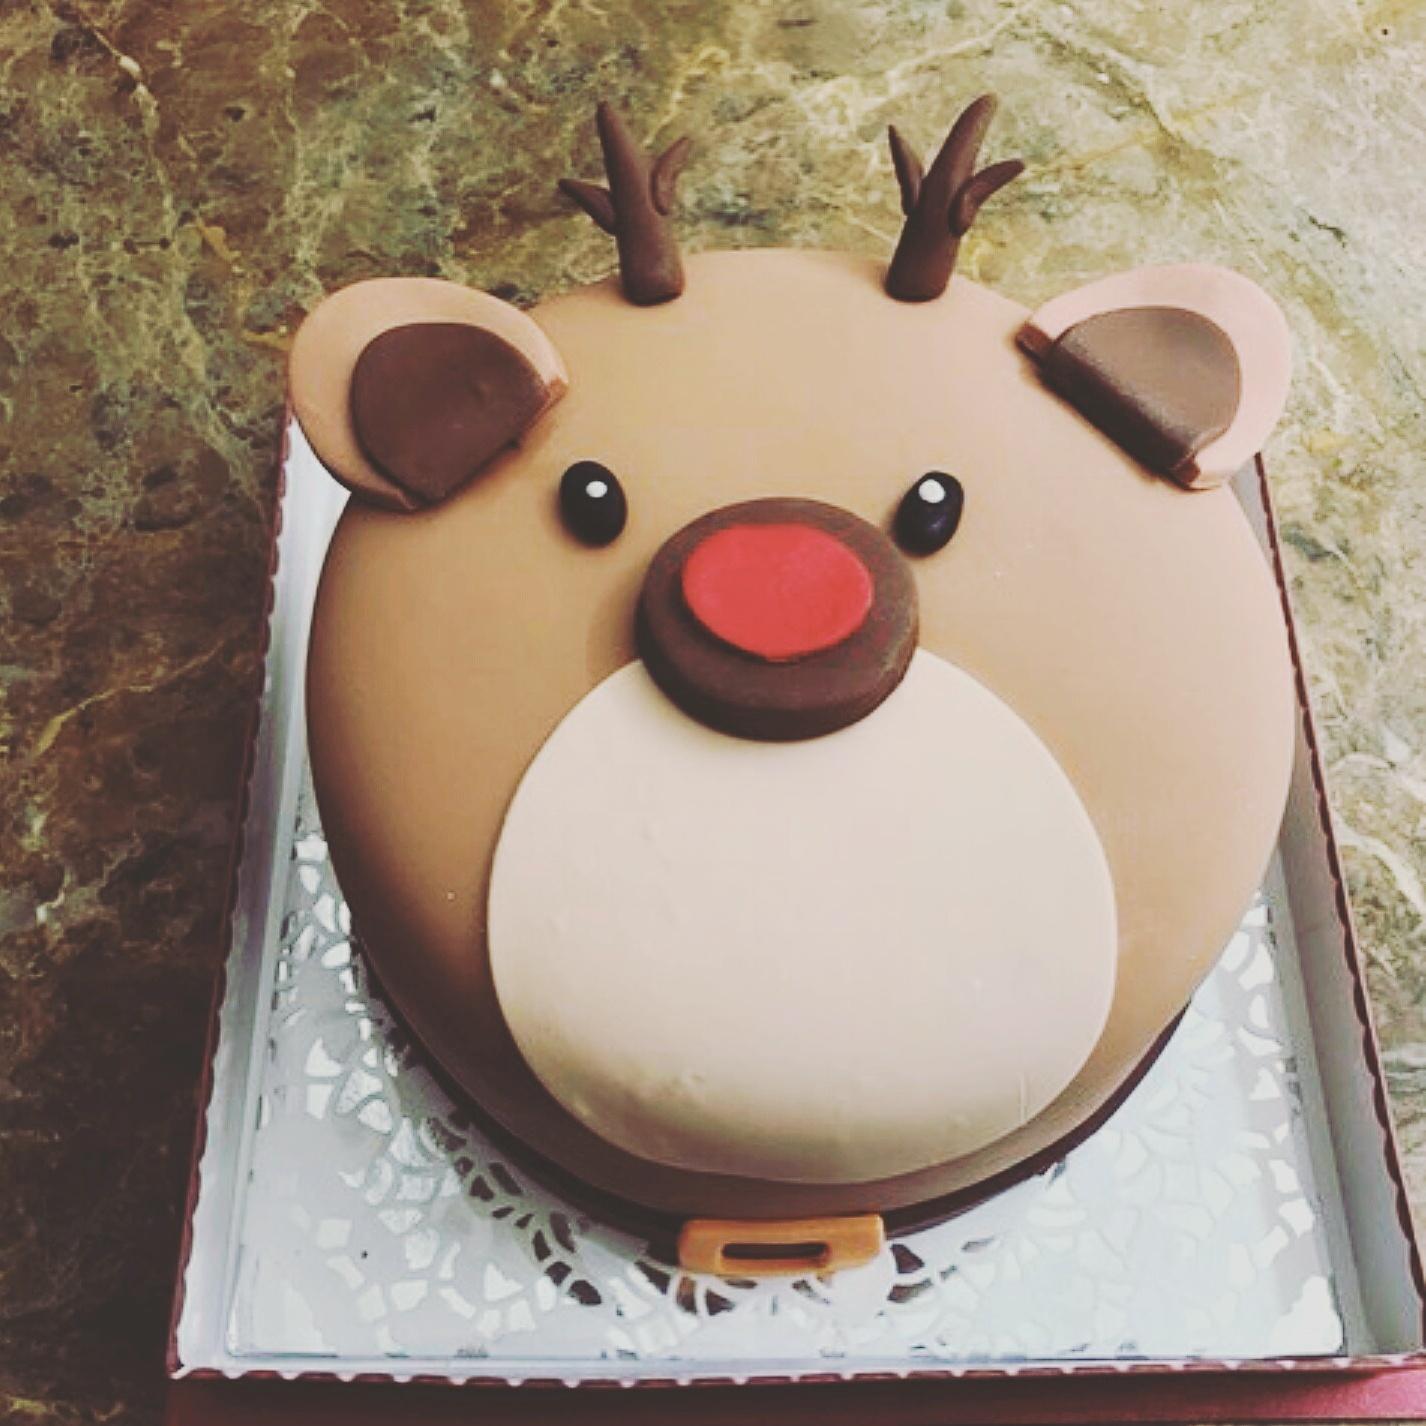 Jual Birthday Cake Tart Kue Ulang Tahun Custom Design 3d